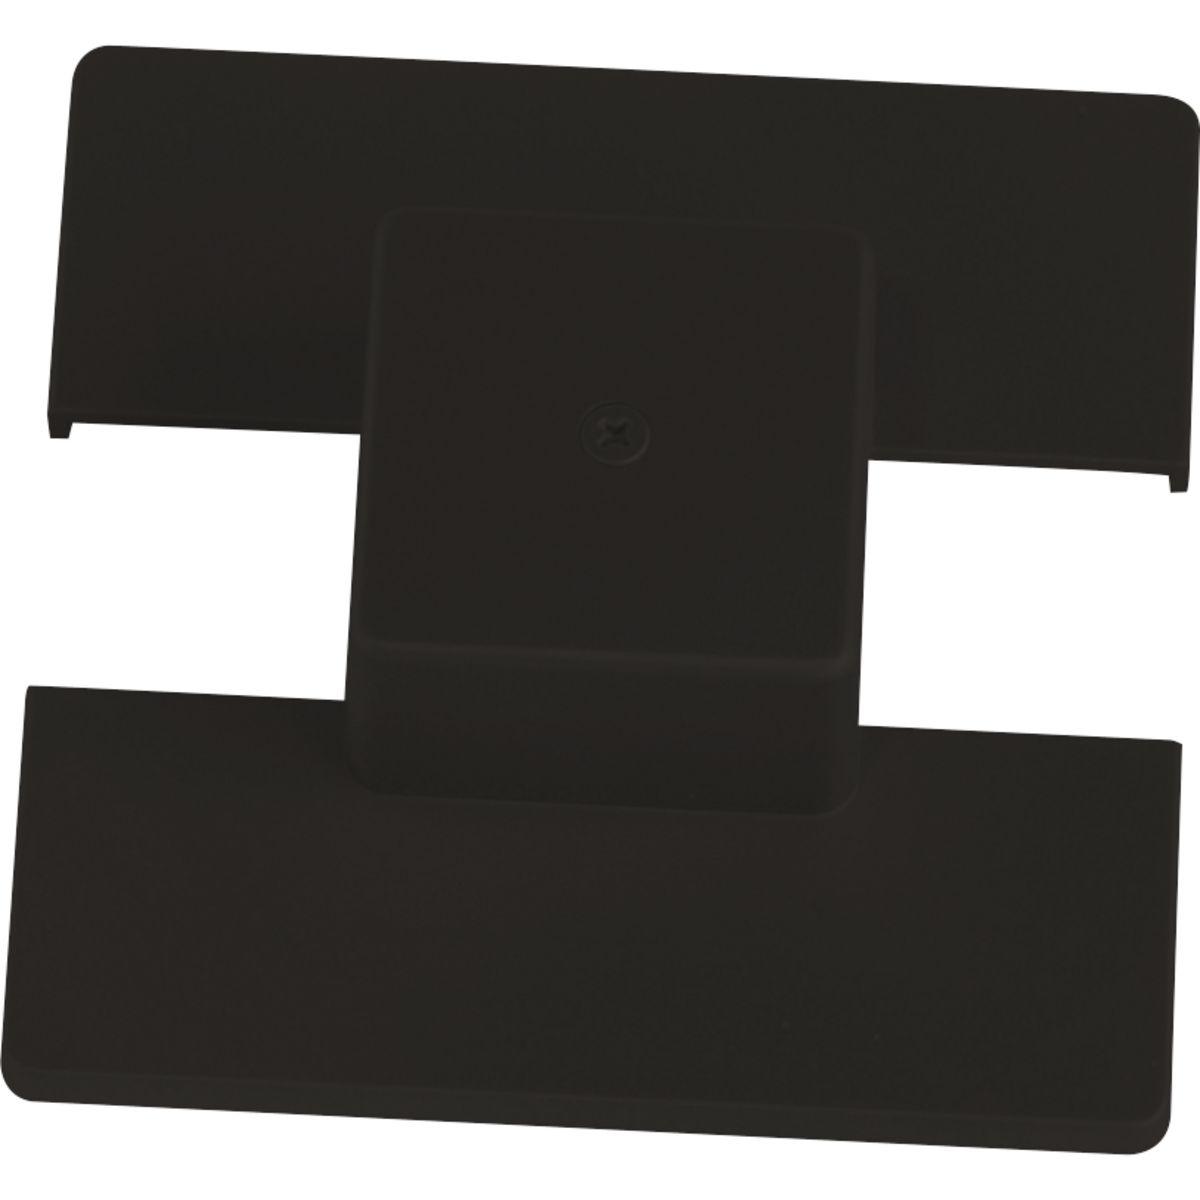 TRACK FLOATING CANOPY black